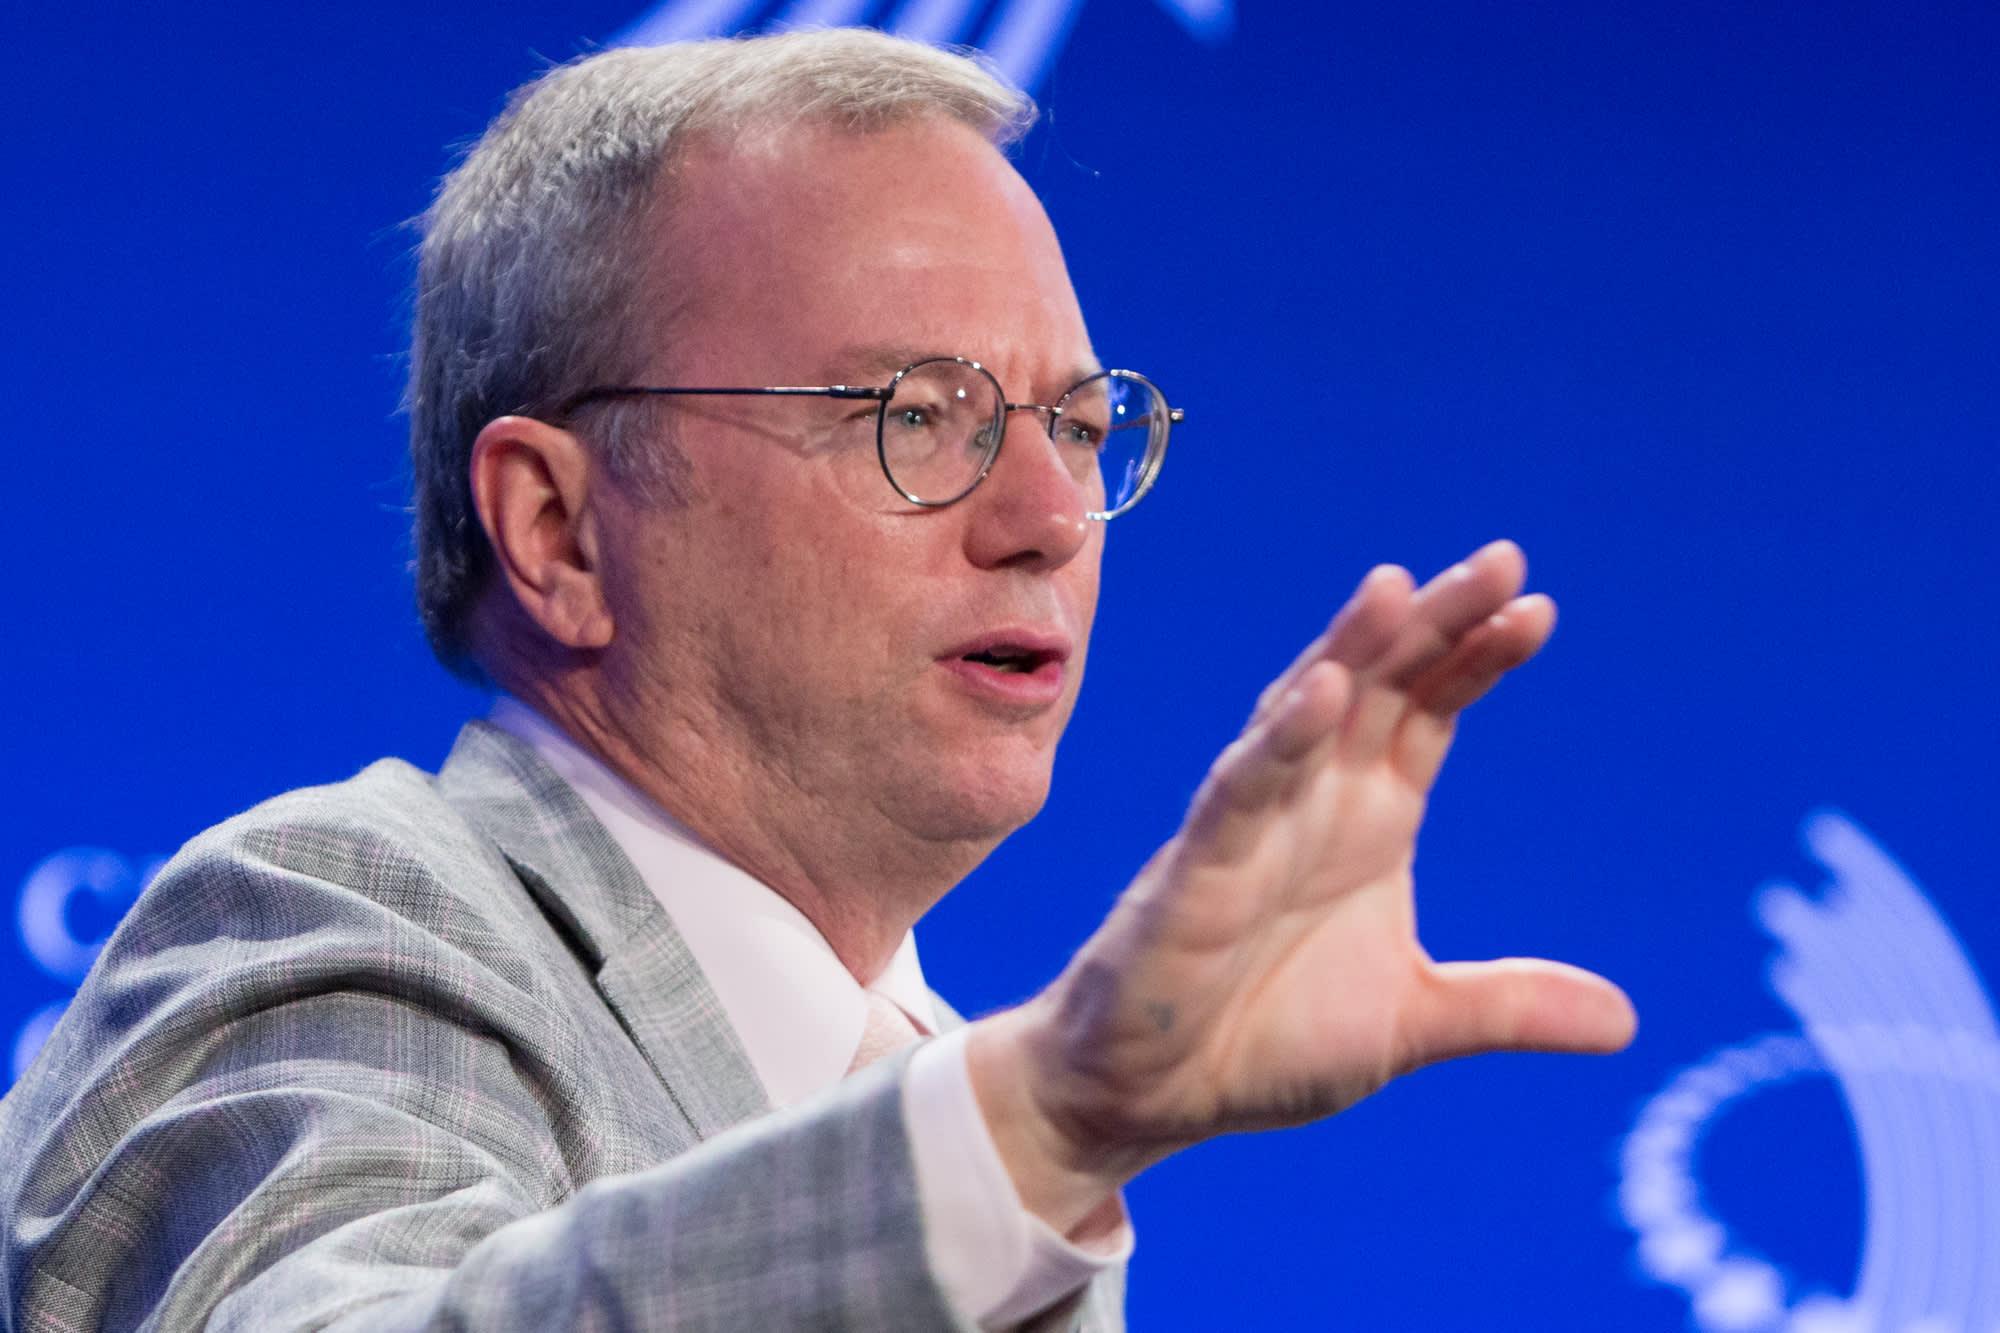 Former Google CEO Eric Schmidt believes biology is the next frontier in computing